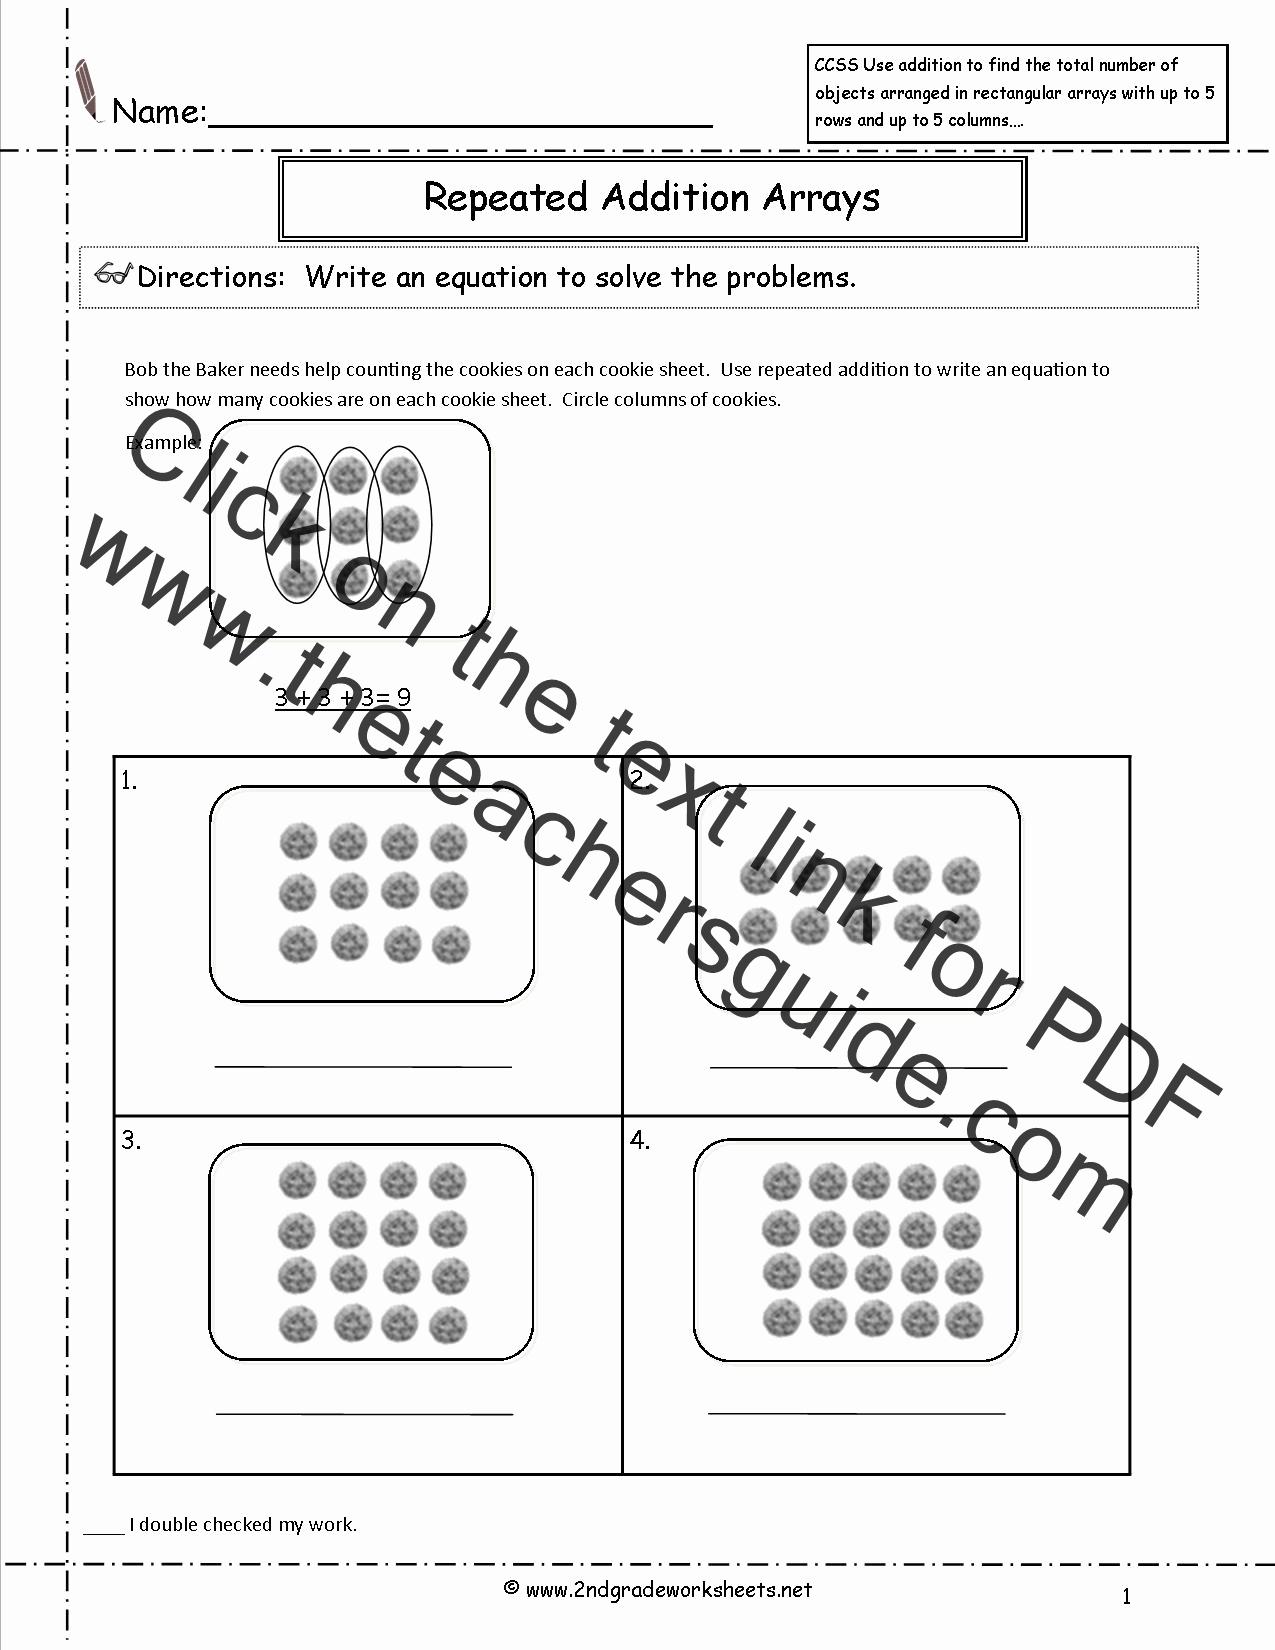 Arrays Worksheets Grade 2 Unique V Moncoreexamples